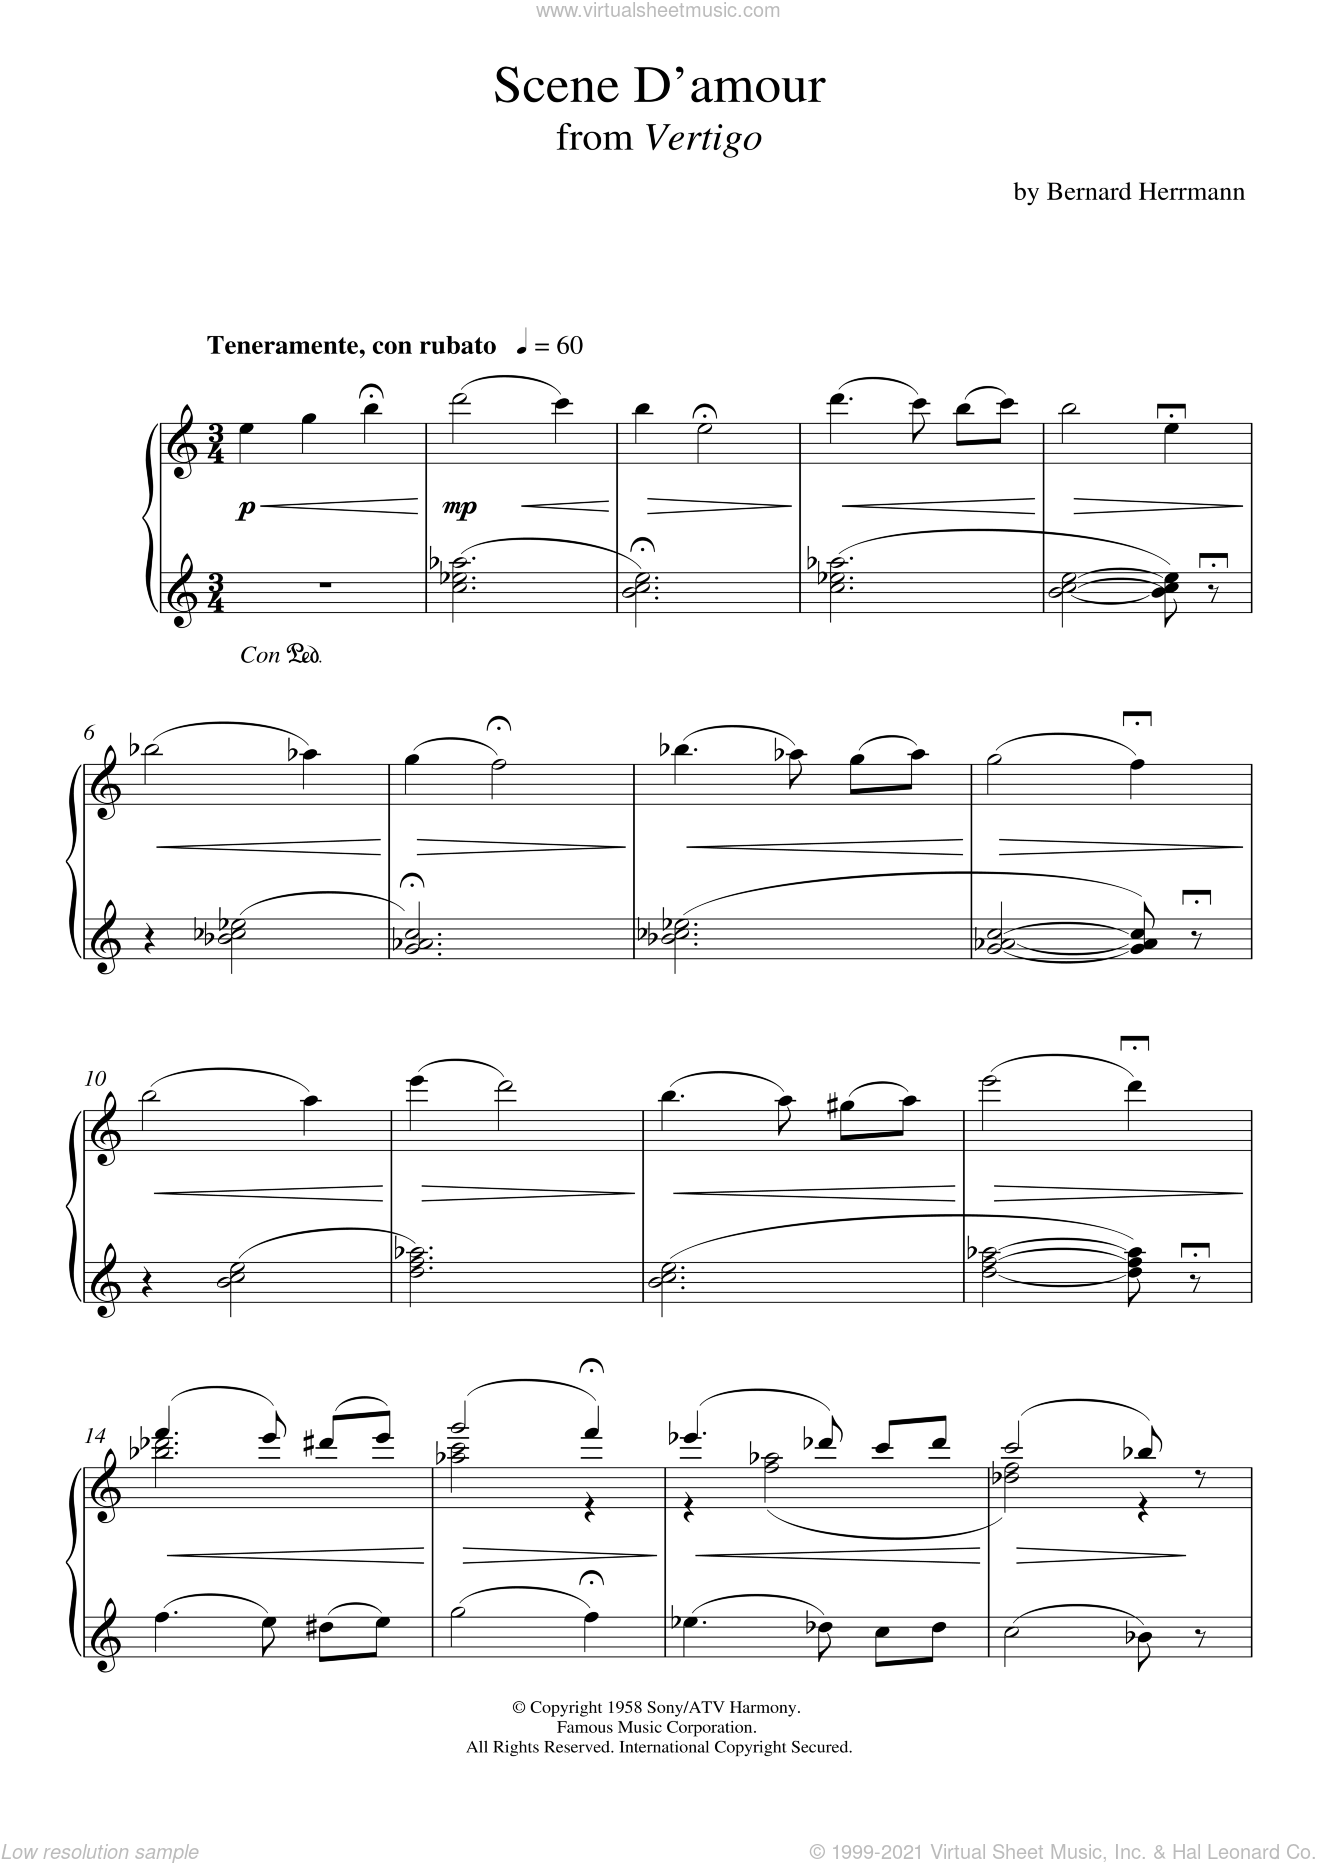 Scene D'amour From Vertigo sheet music for piano solo by Bernard Herrmann, intermediate skill level